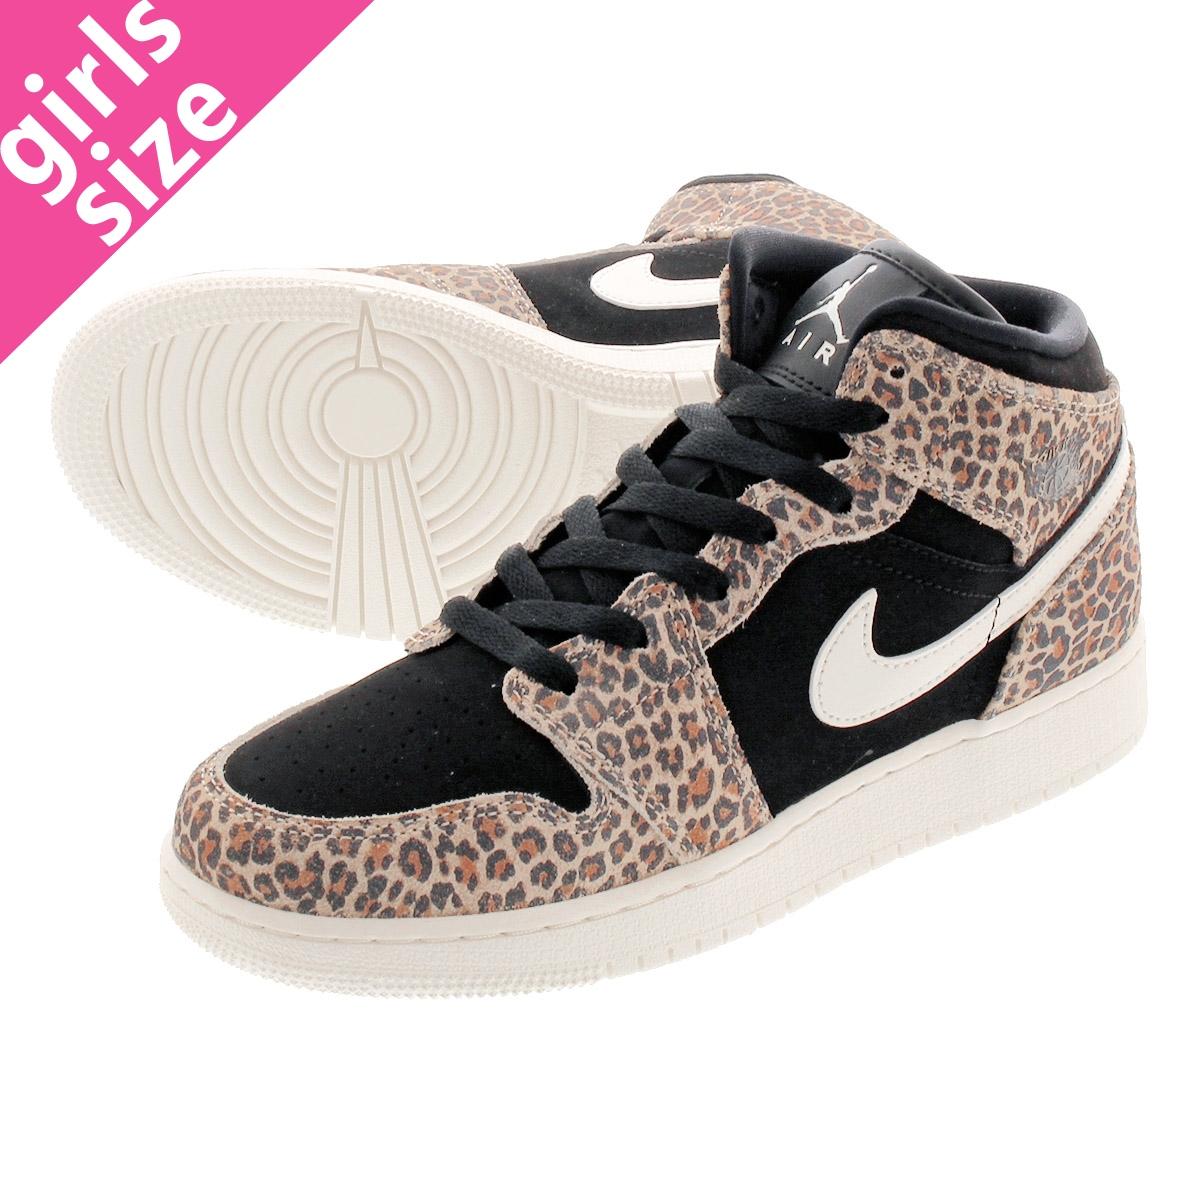 NIKE AIR JORDAN 1 MID SE GS Nike Air Jordan 1 mid SE GS BLACKPALE IVORY DESERT ORE bq6931 021